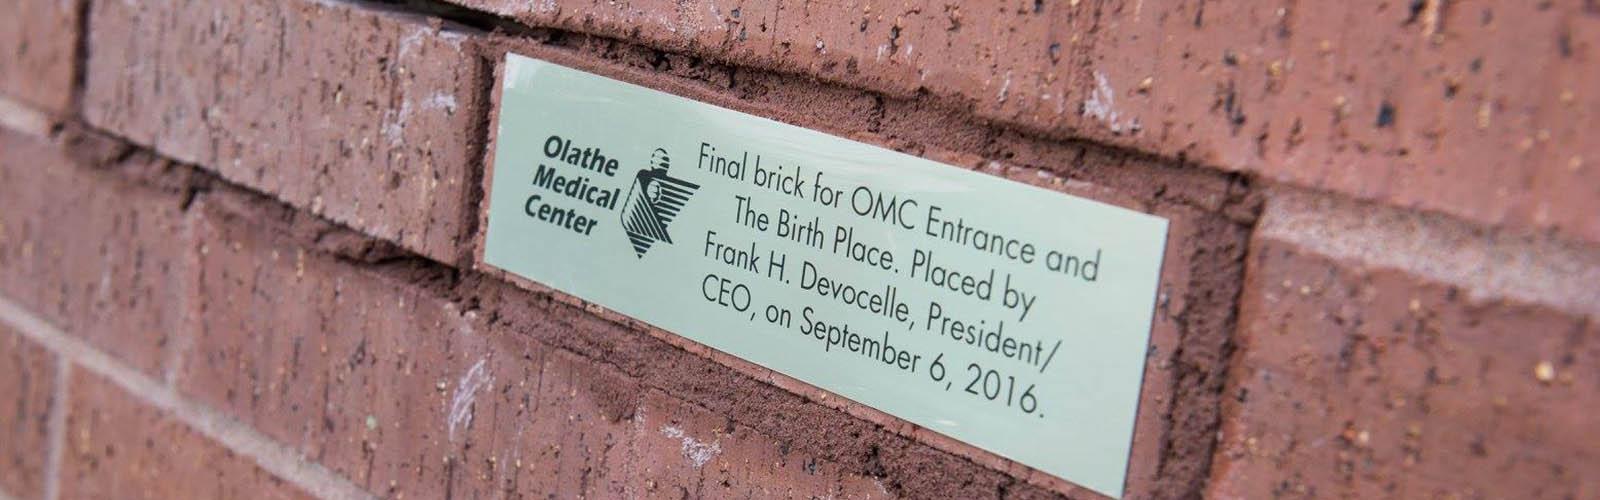 OMC Entrance Brick